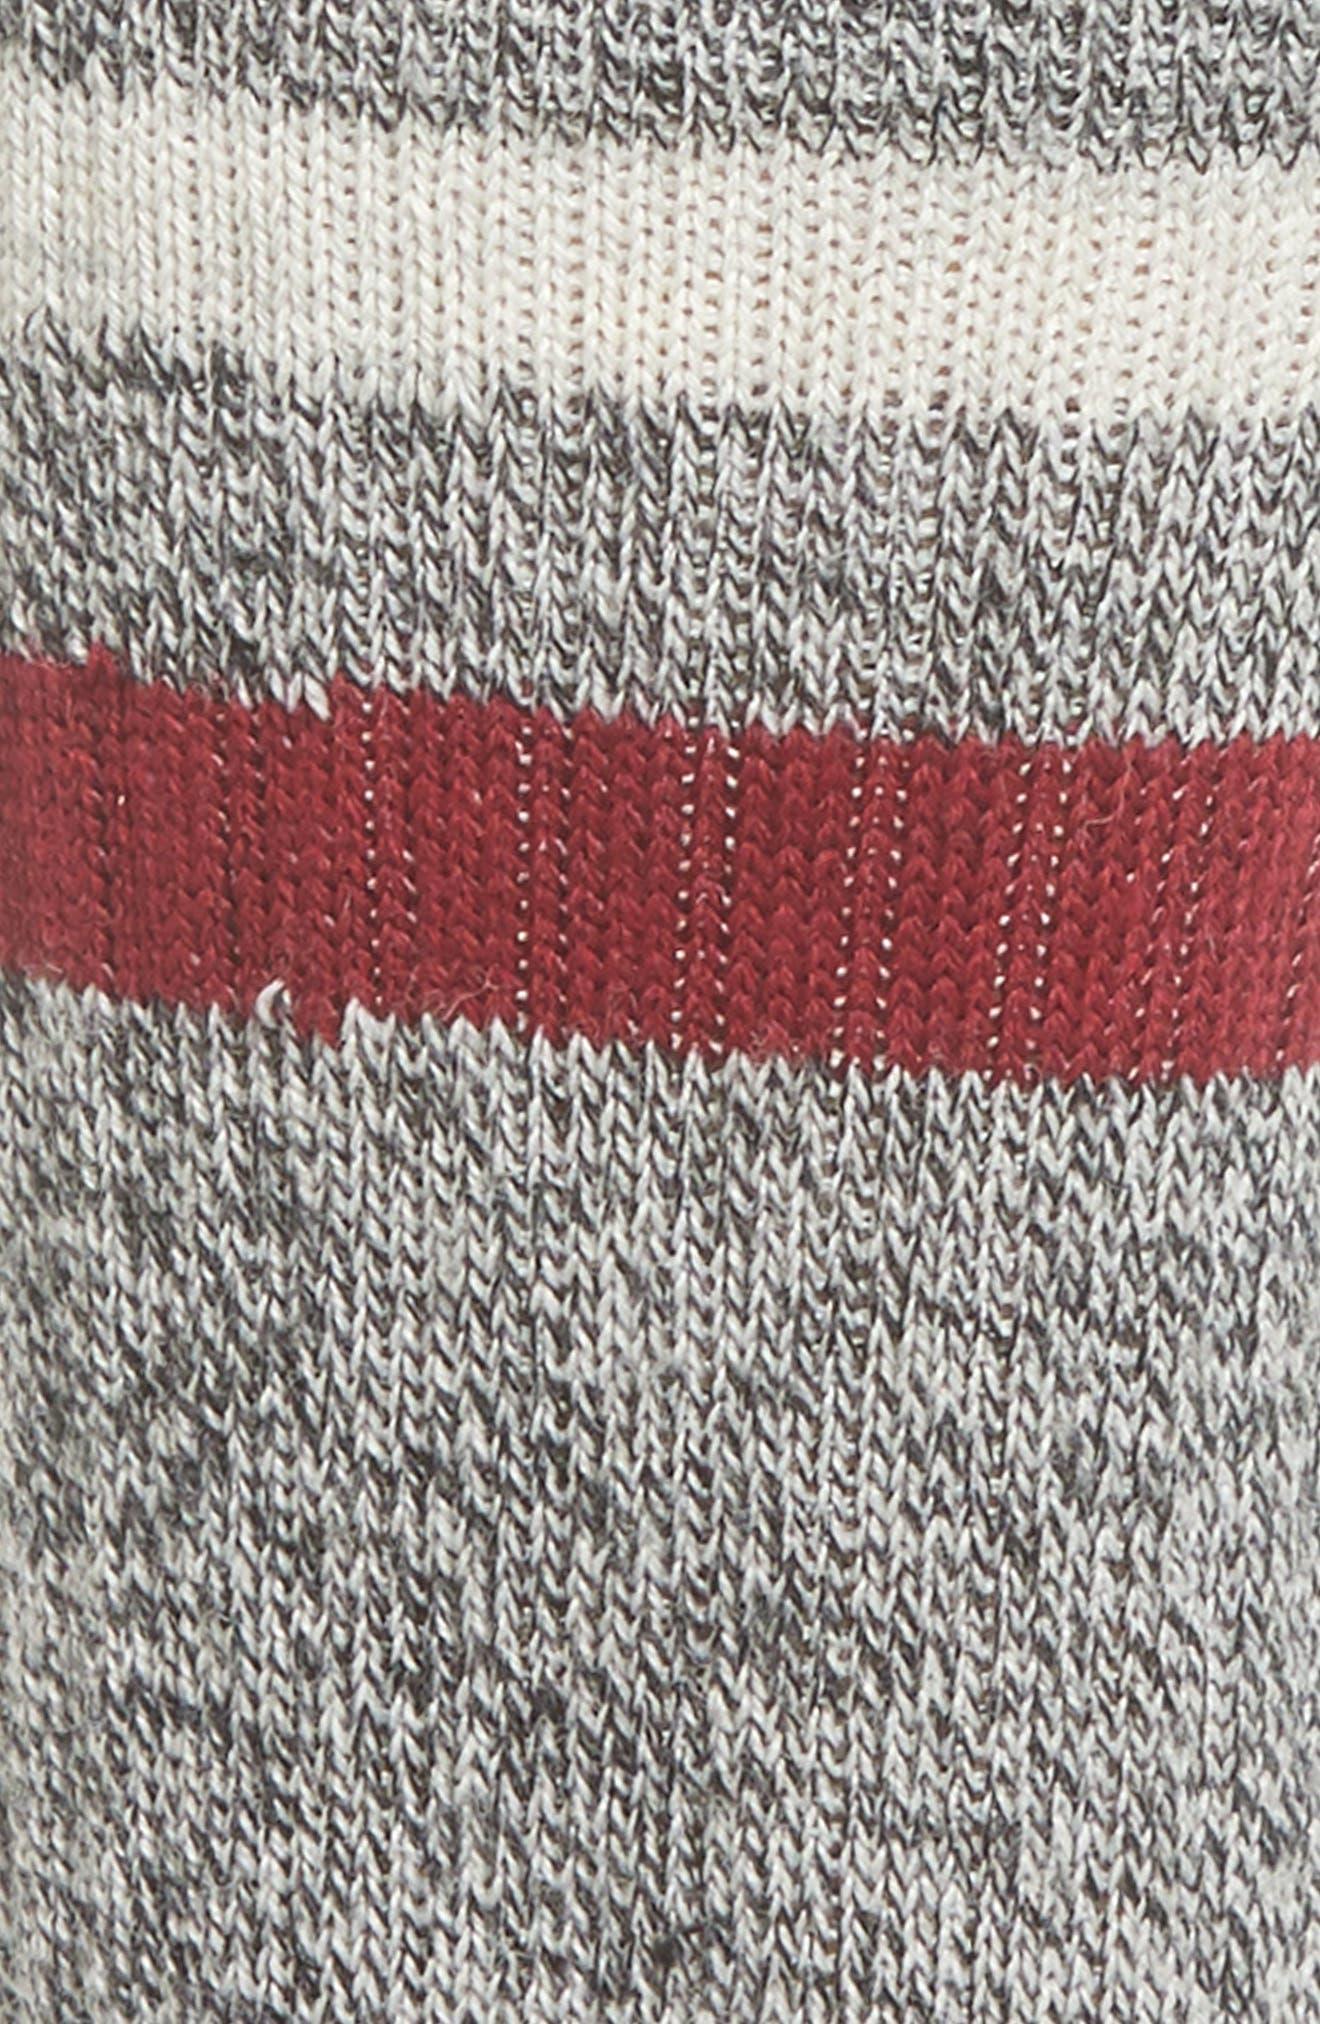 Birkie Stripe Crew Socks,                             Alternate thumbnail 2, color,                             TIBETAN RED HEATHER